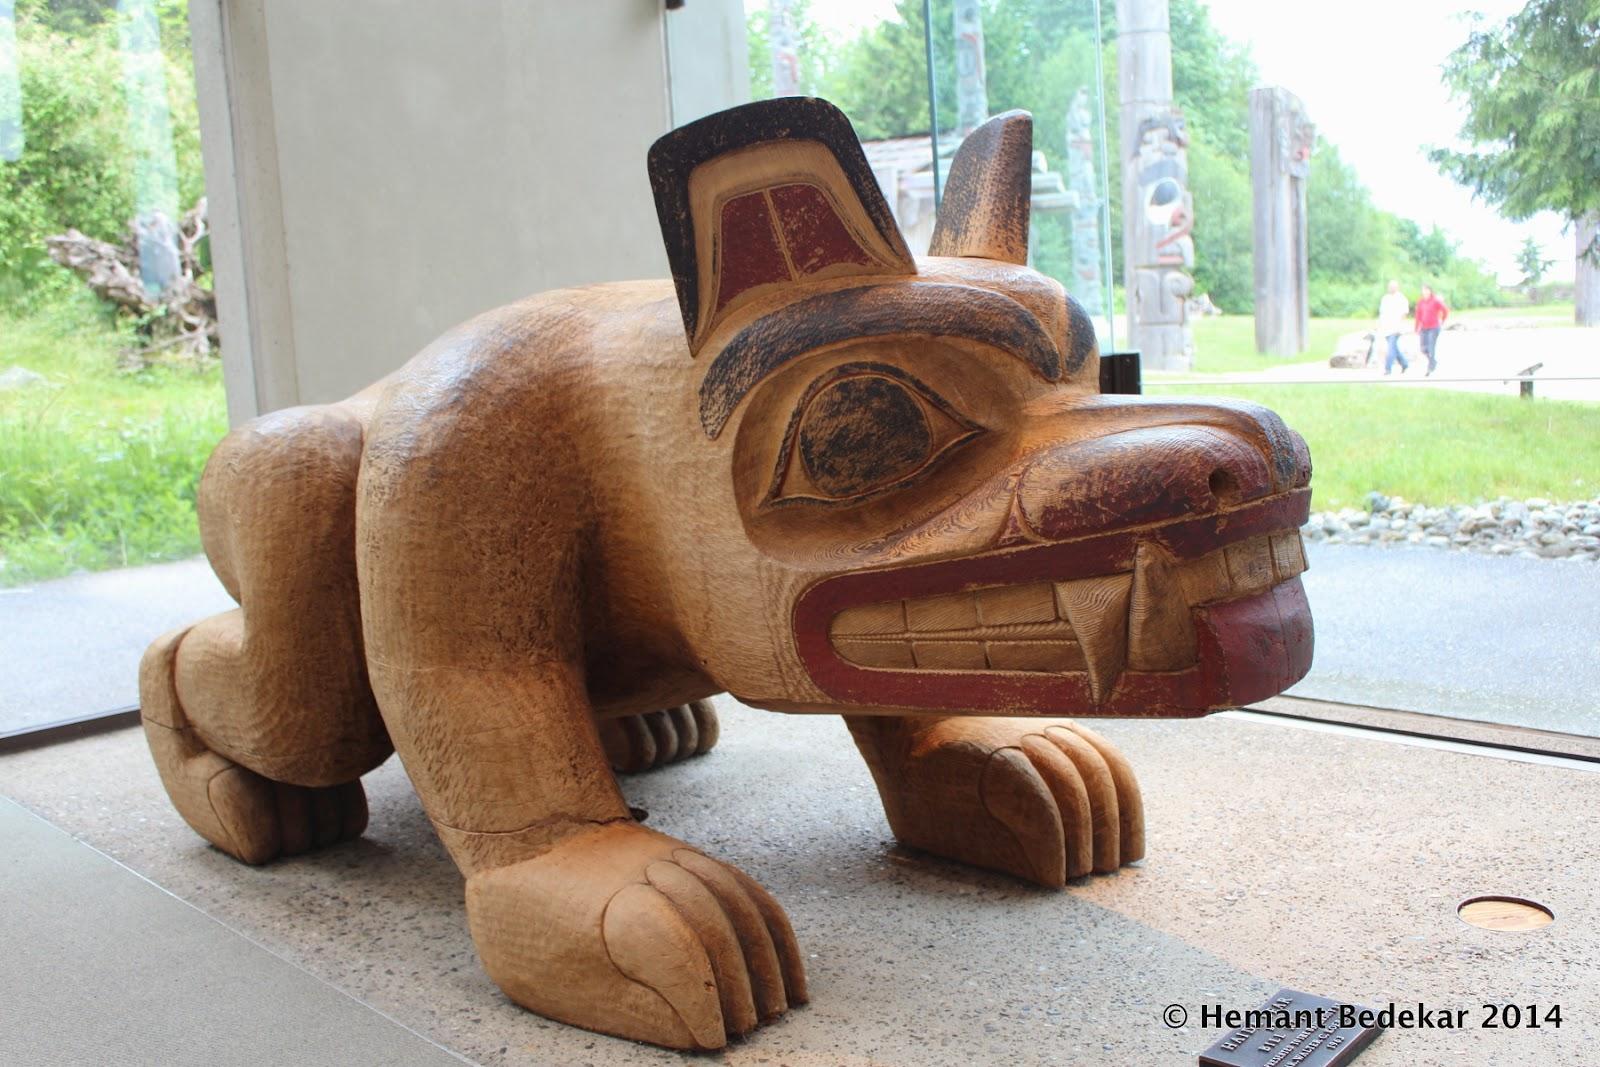 University of British Columbia - Museum of Anthropology